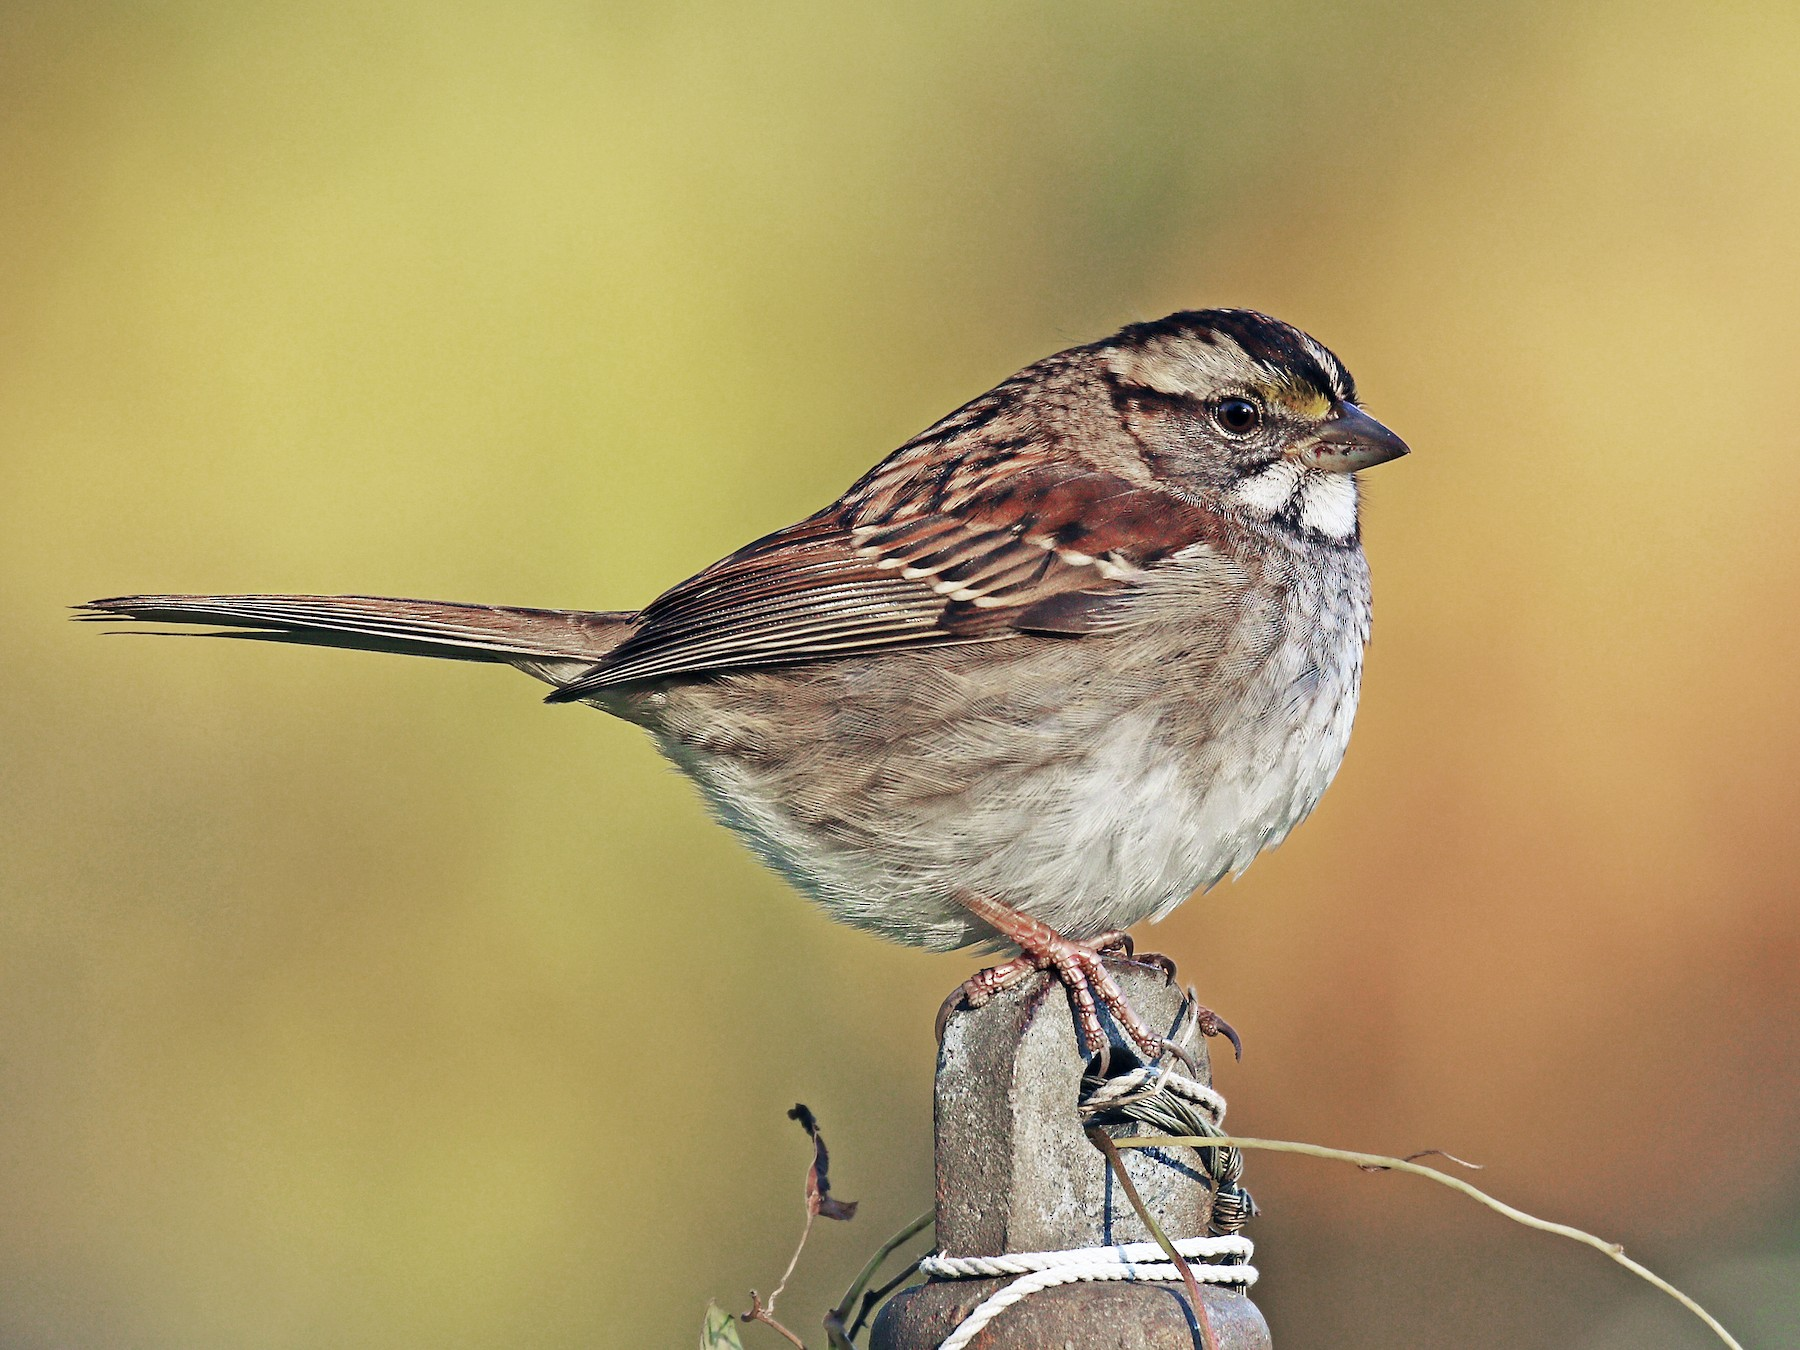 White-throated Sparrow - Ryan Schain